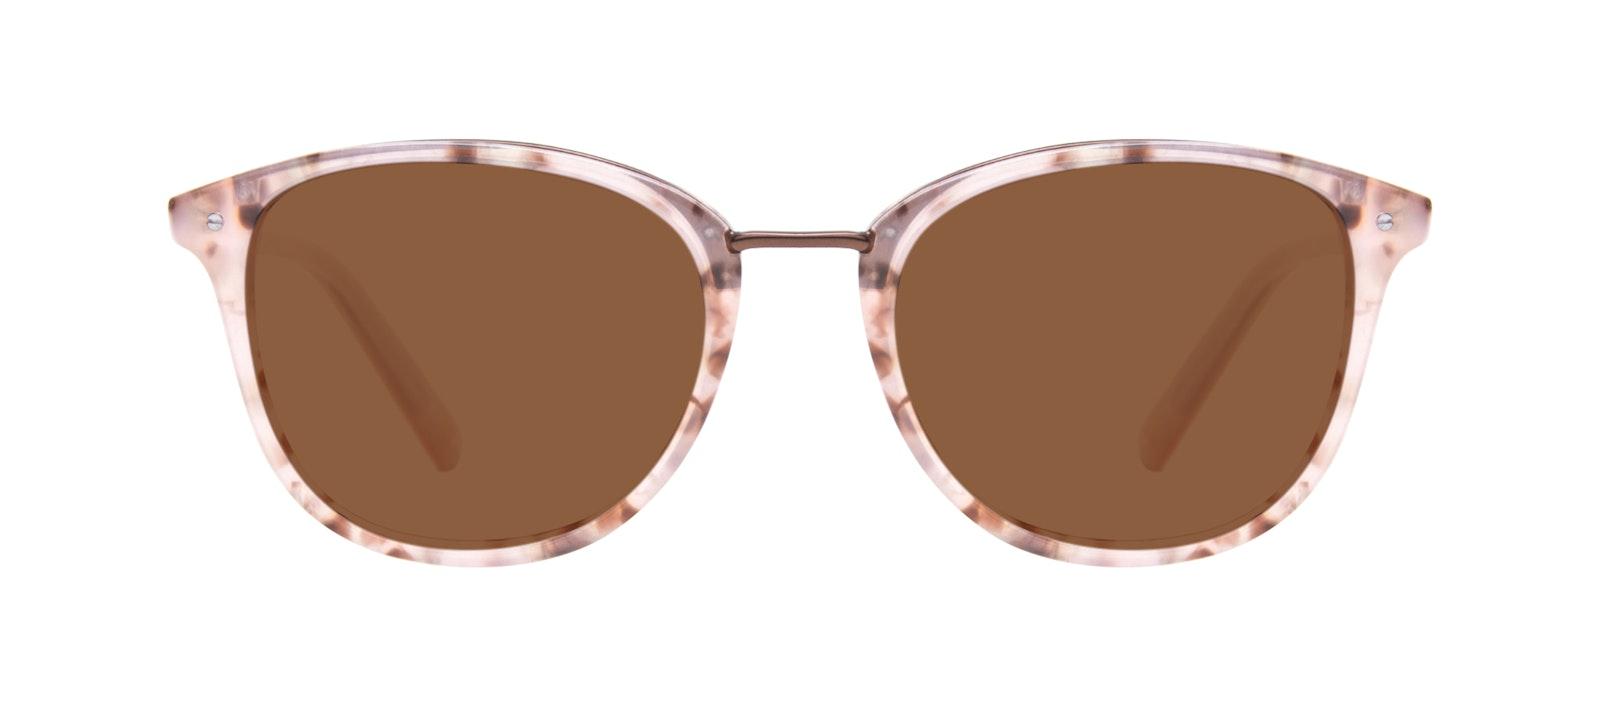 Affordable Fashion Glasses Square Round Sunglasses Women Bella Blush Tortie Front